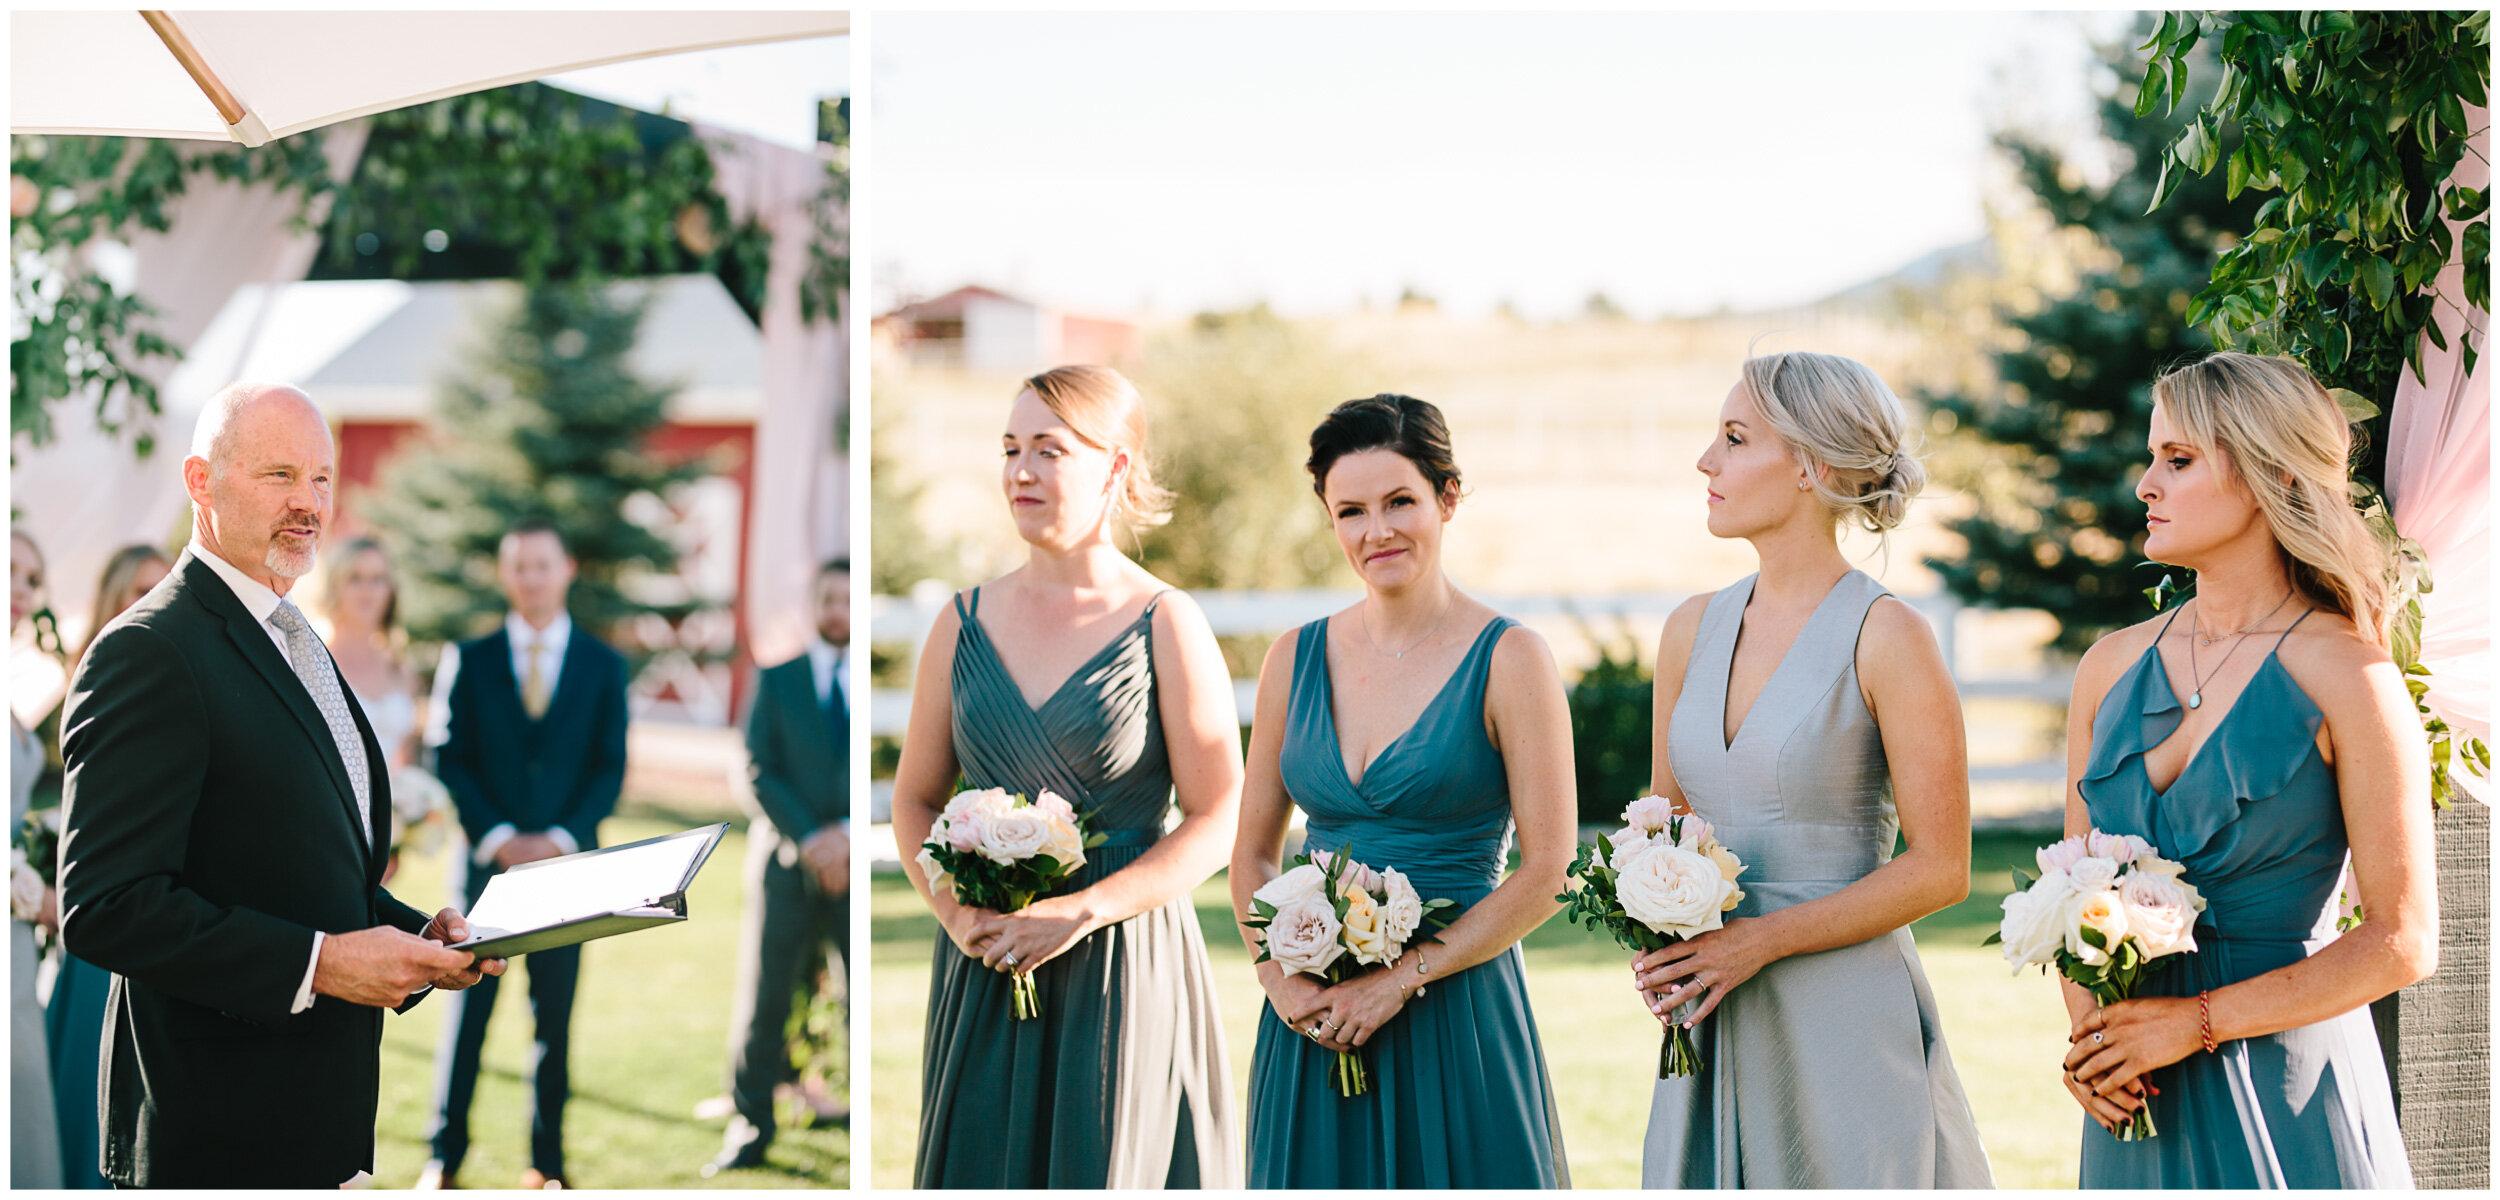 larkspur_colorado_wedding_41.jpg